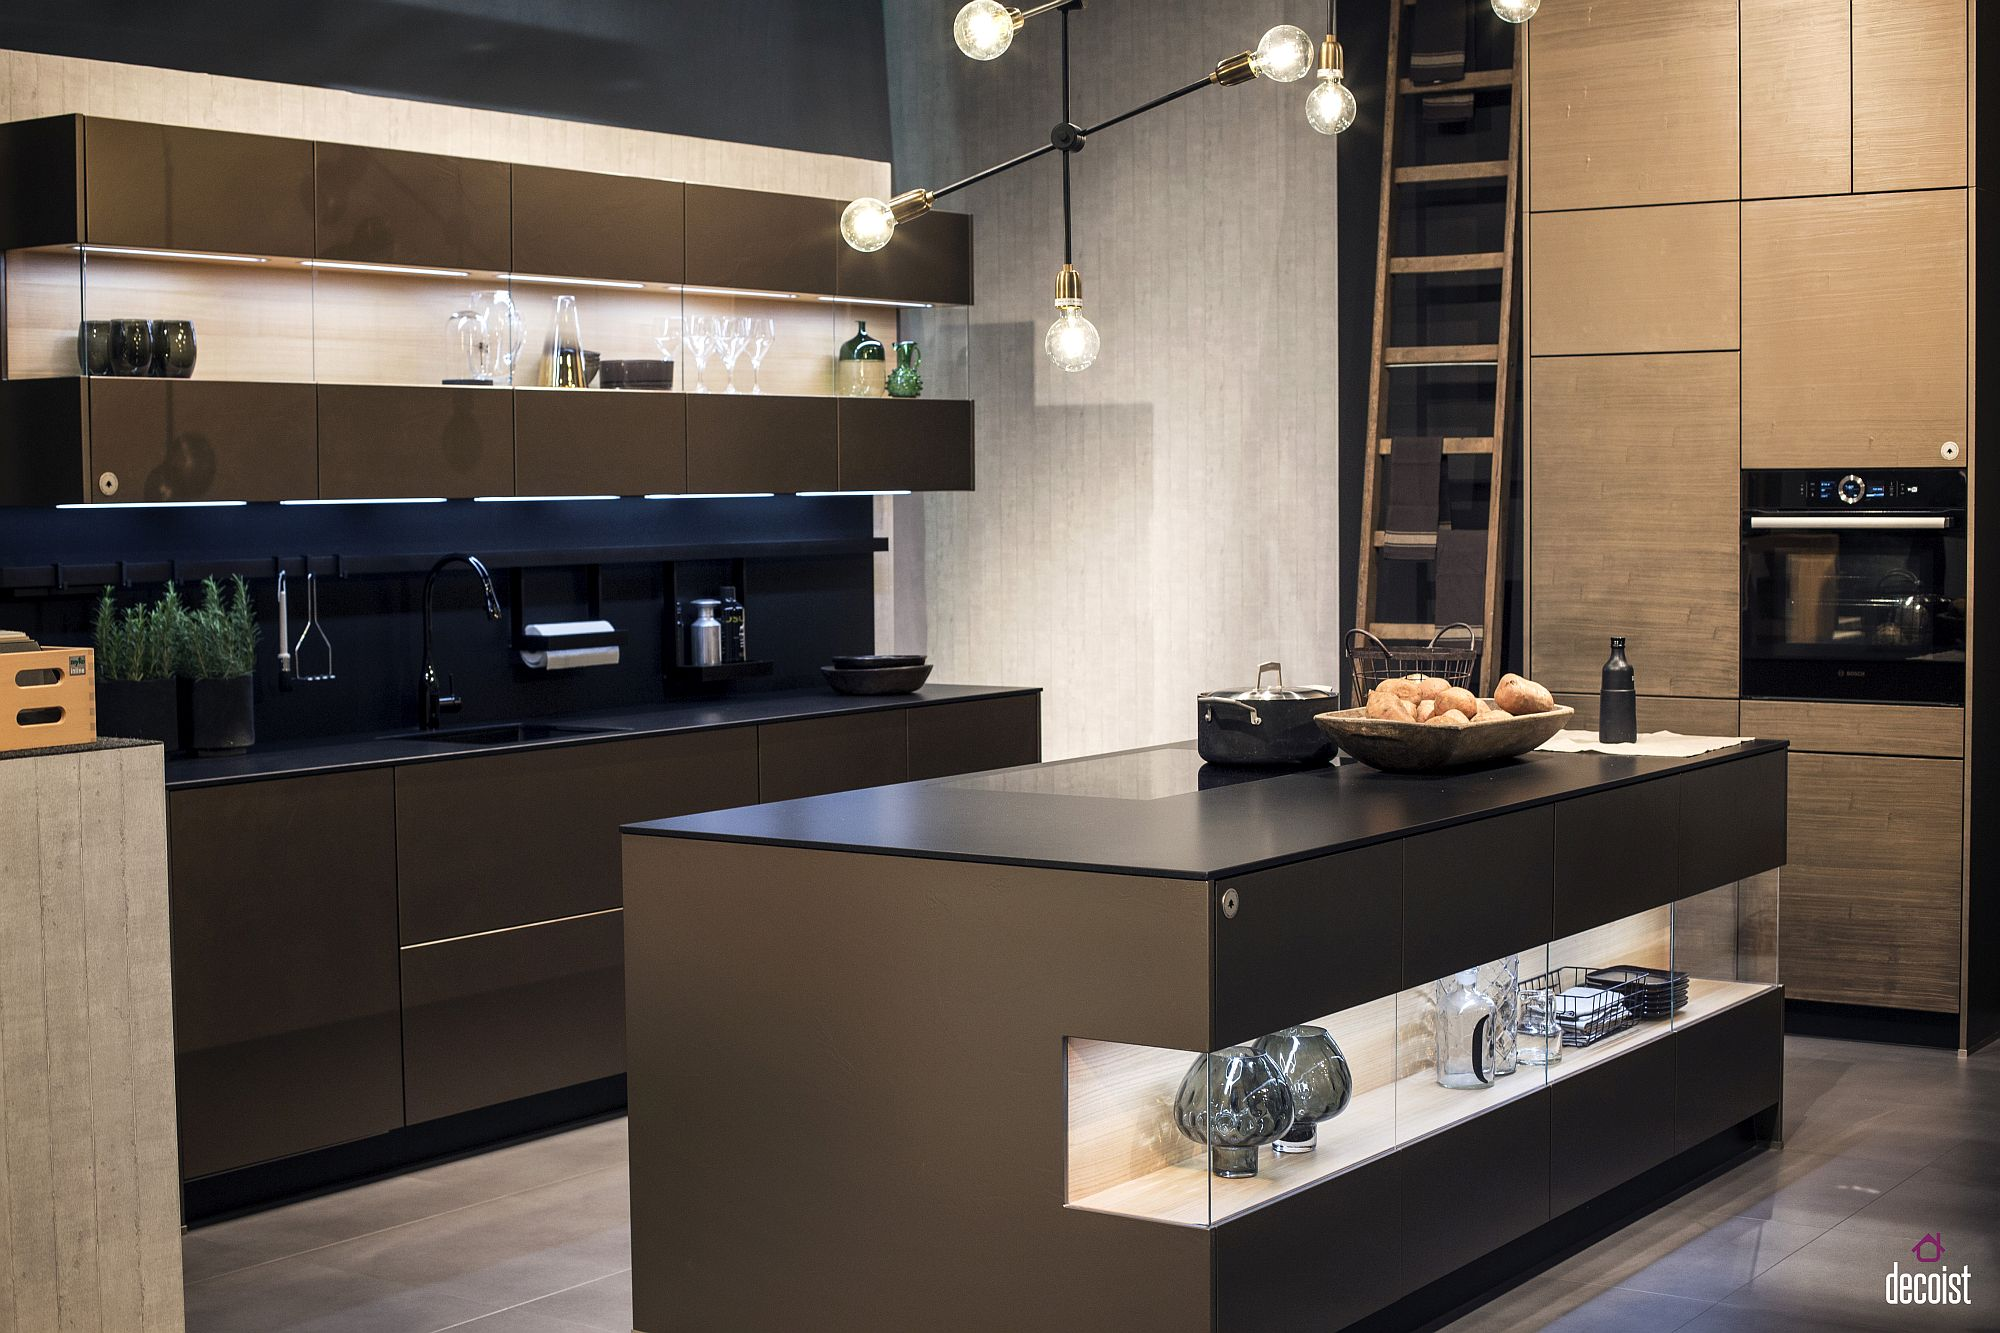 Illuminated-open-shelf-for-the-elegant-kitchen-island